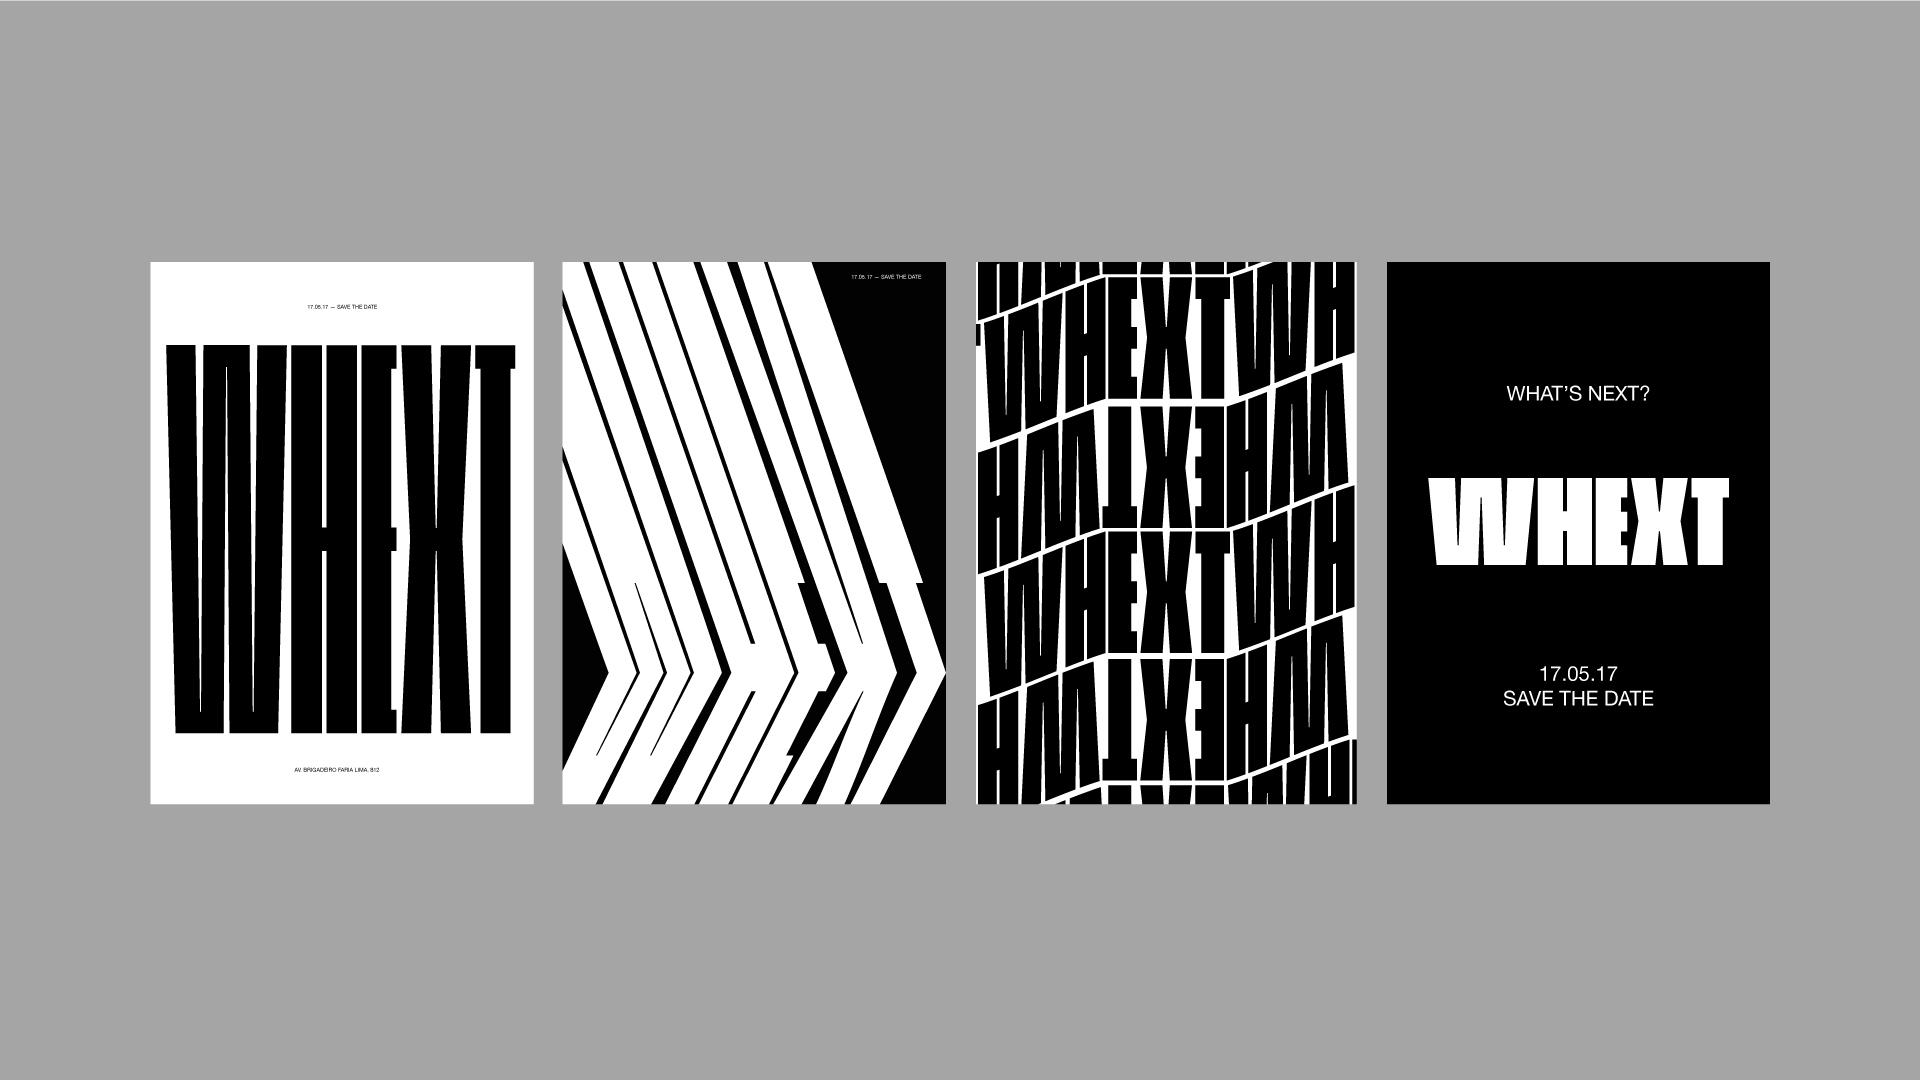 whext_posters_horizo